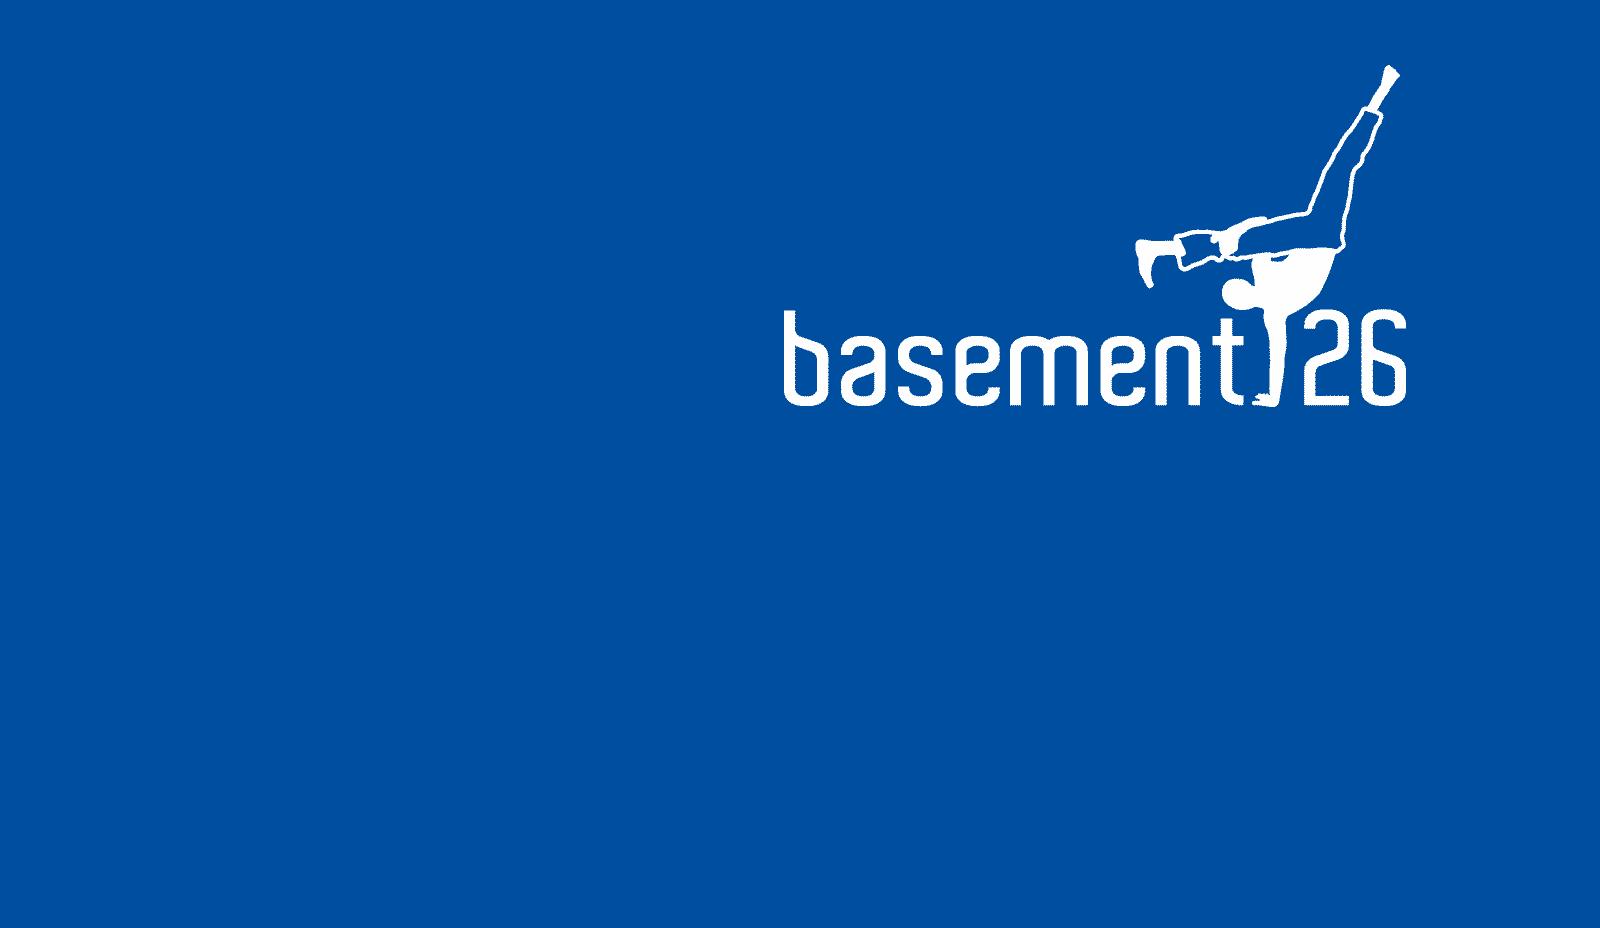 Basement-26